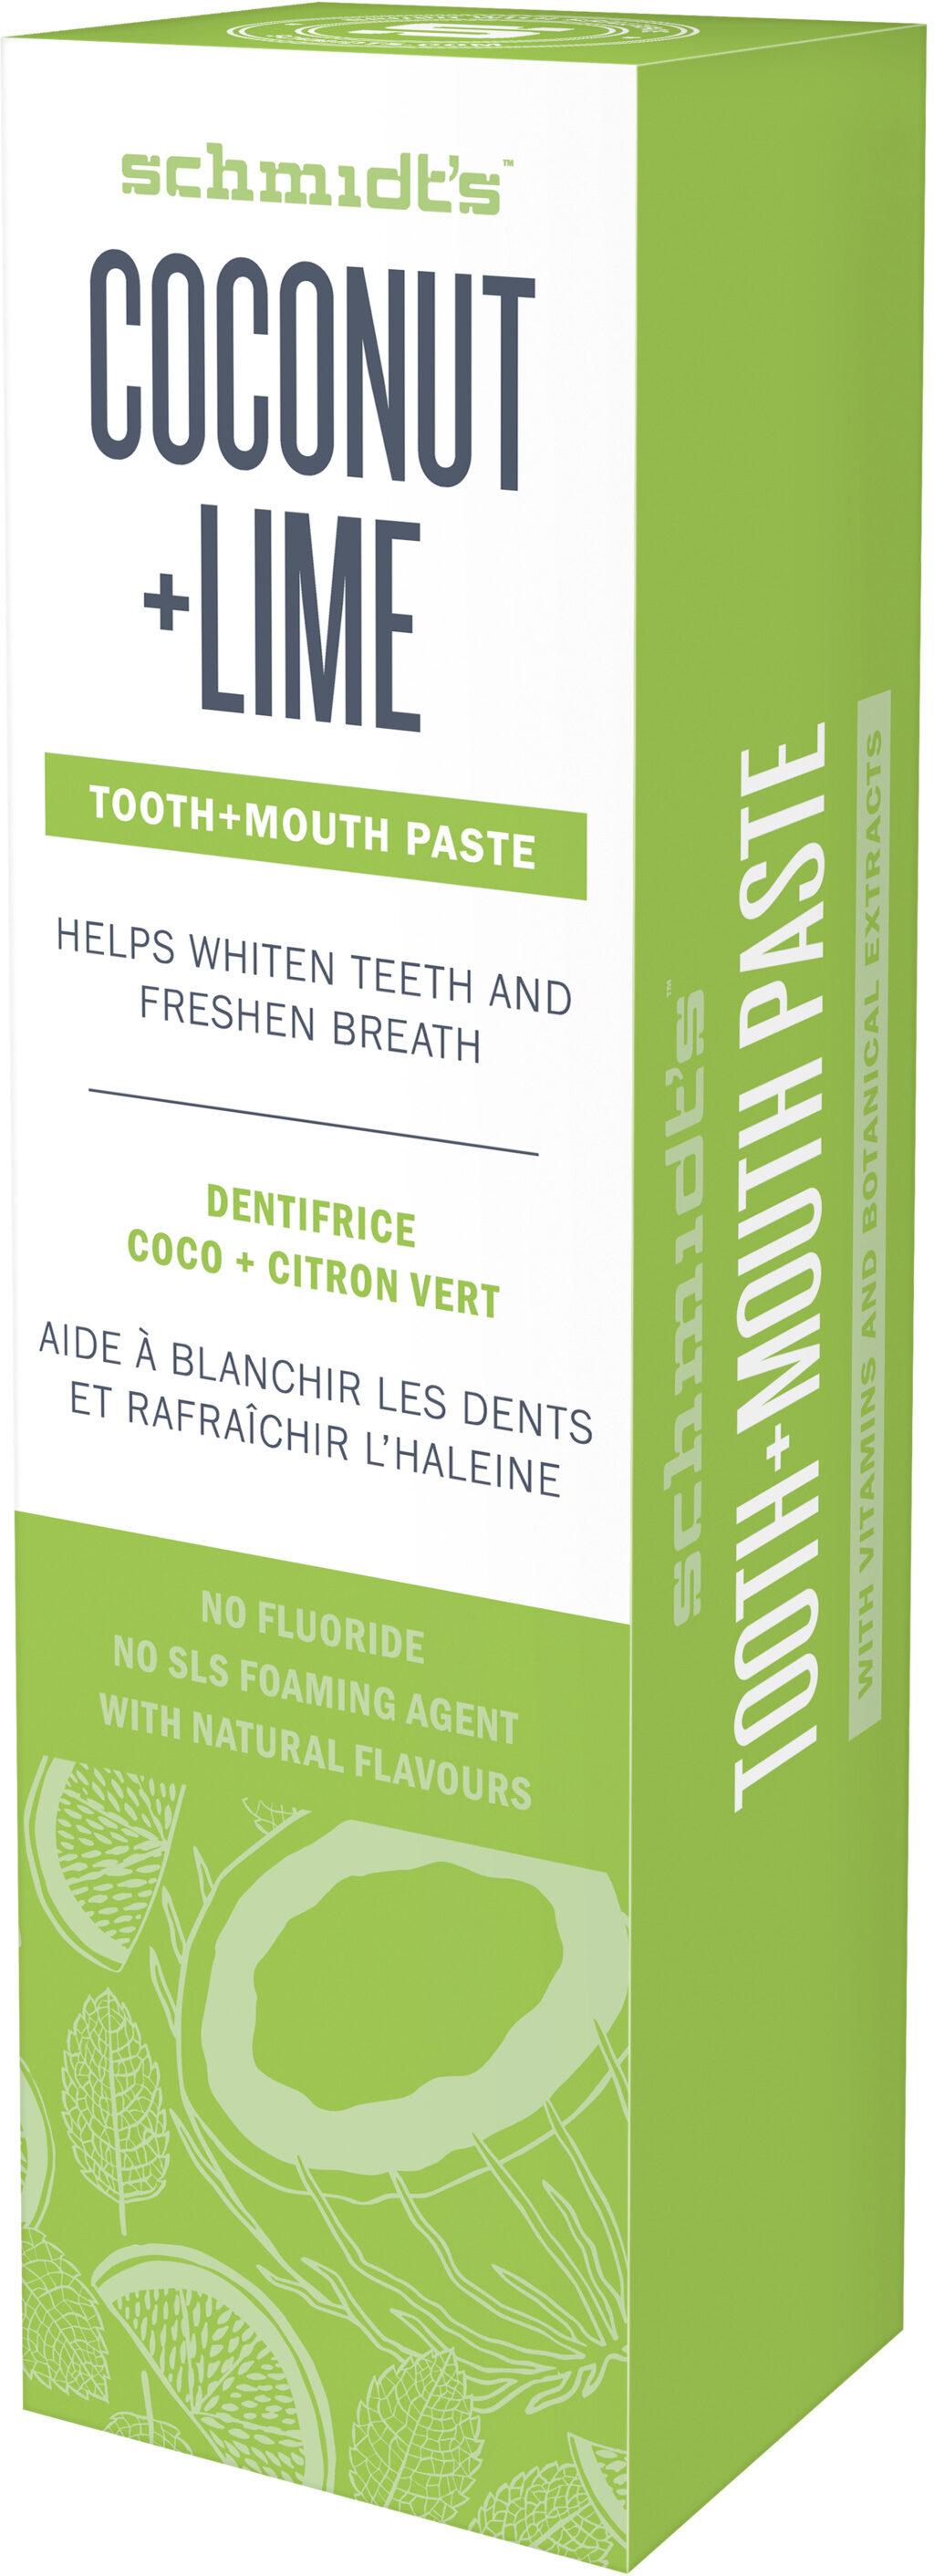 Schmidt's Dentifrice Noix de Coco & Citron Vert - Product - fr